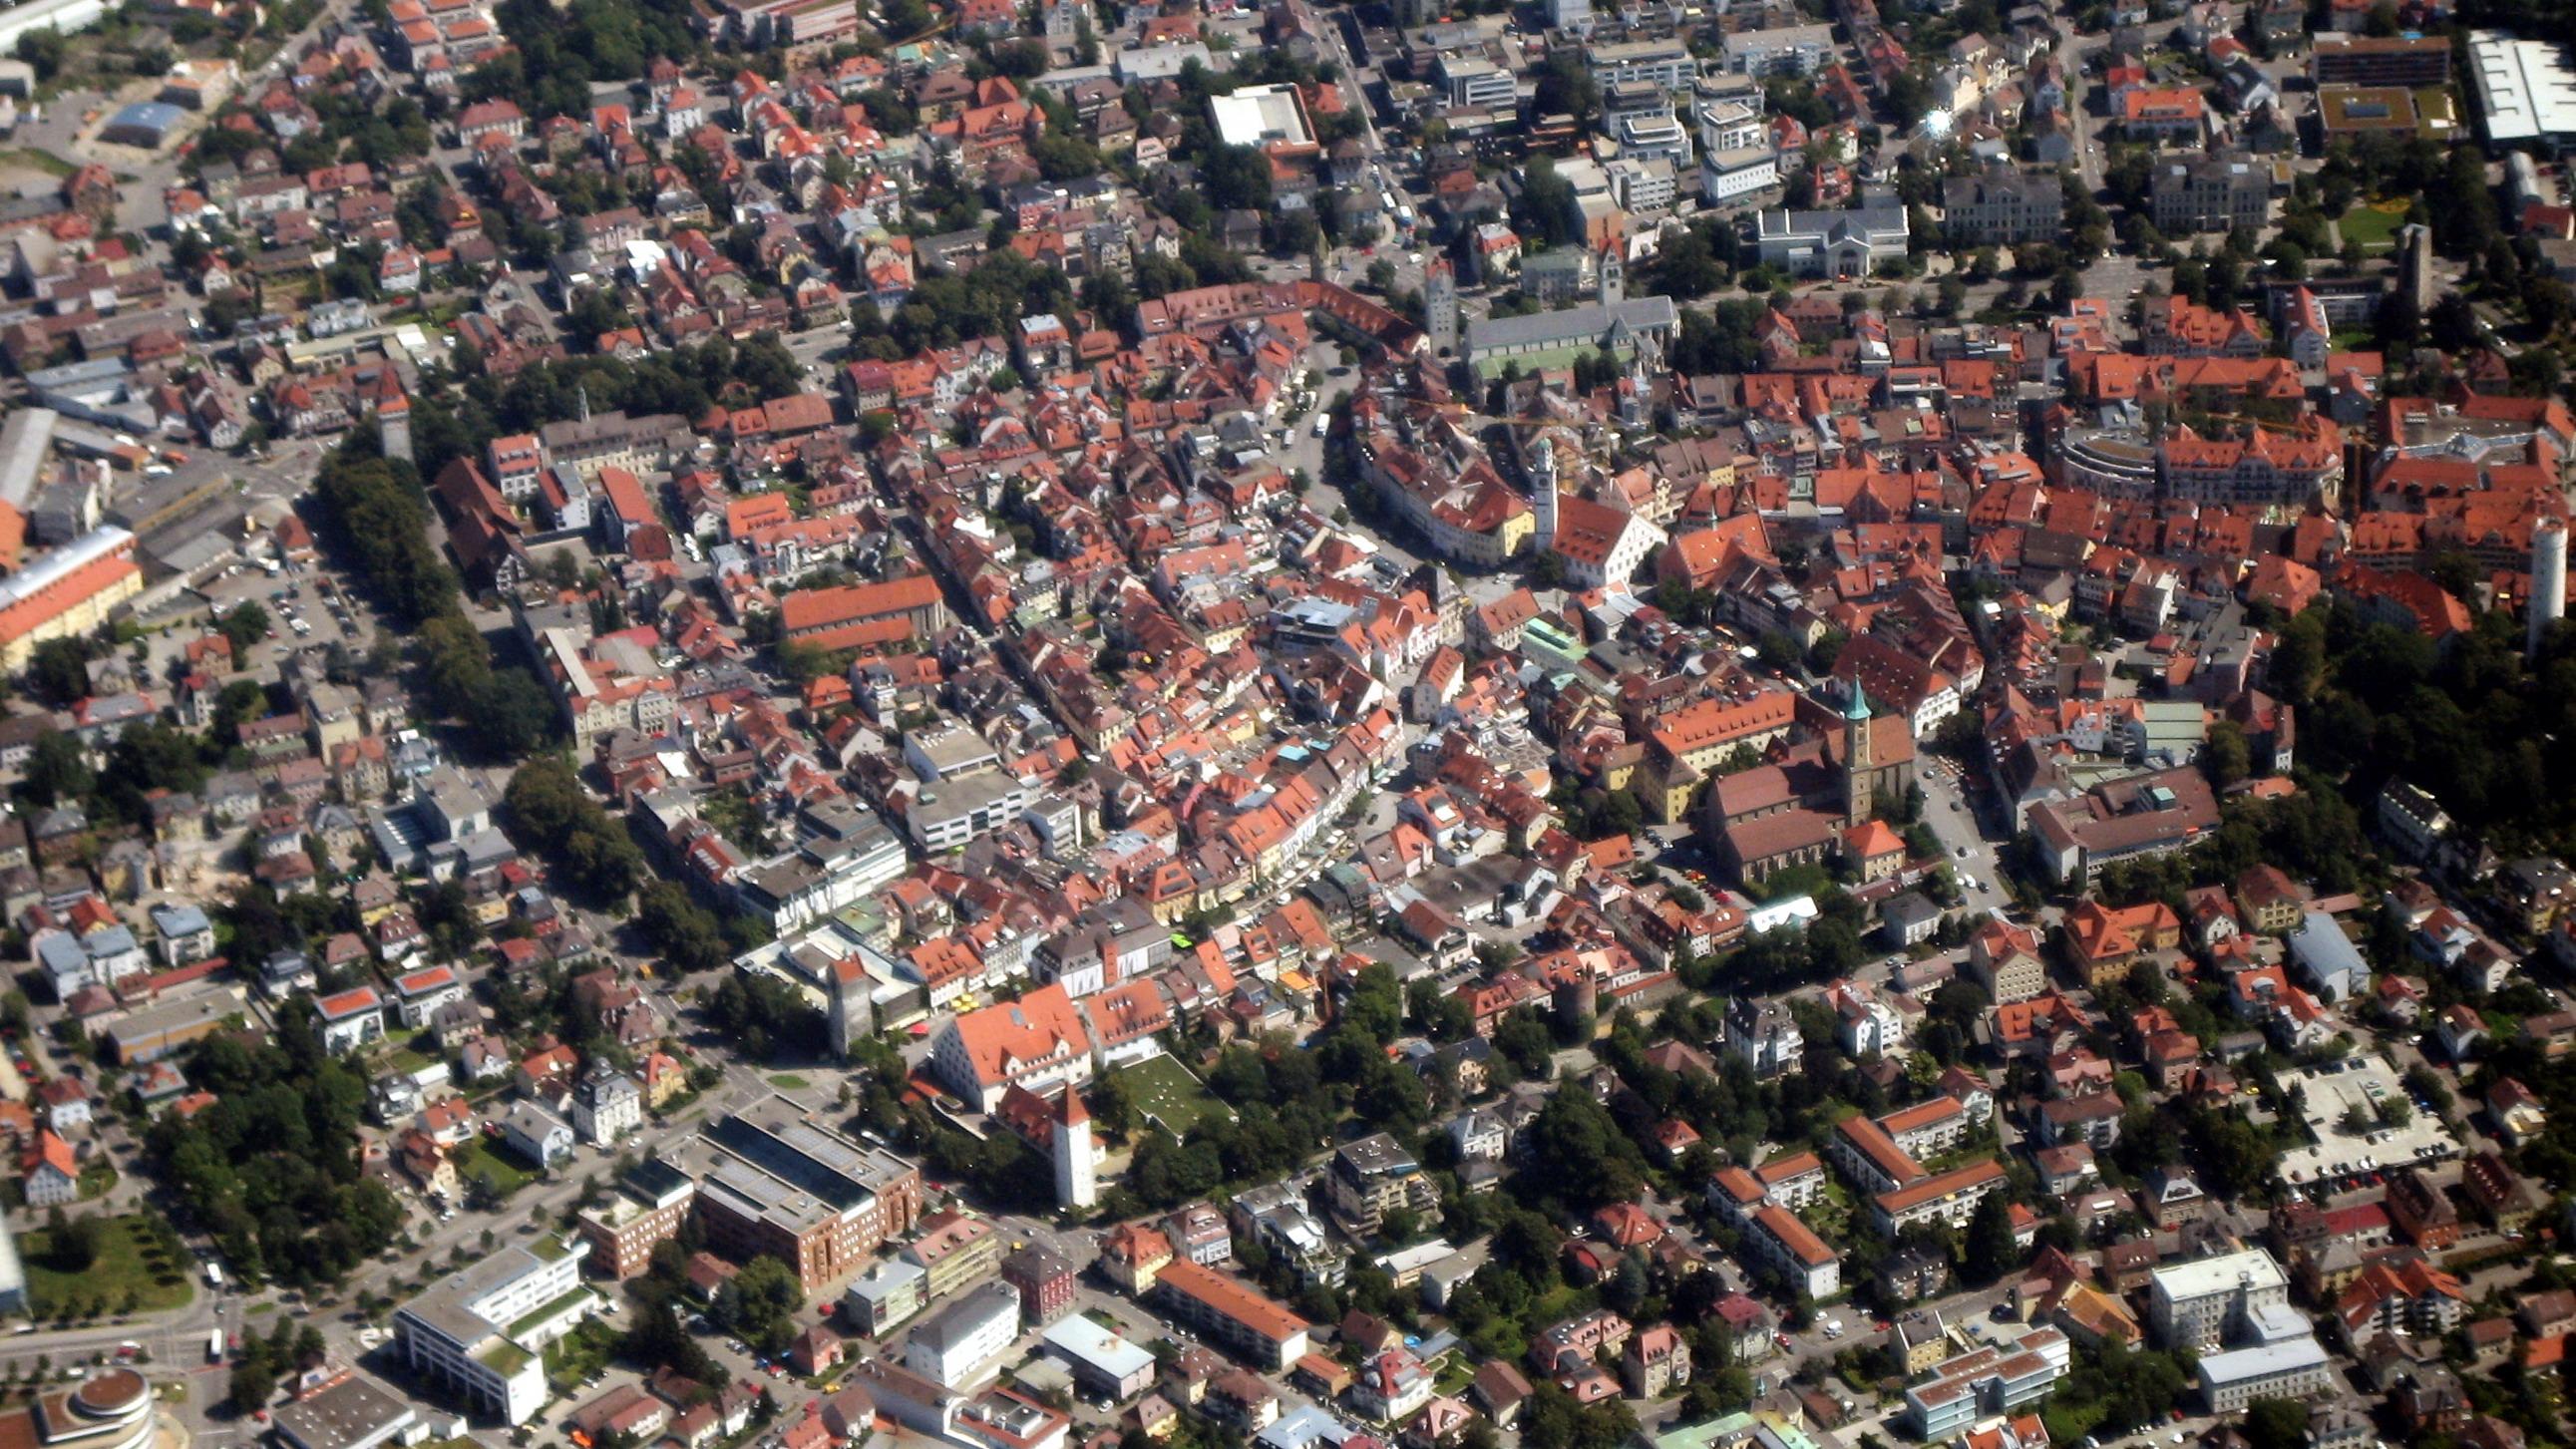 Ravensburgbreit